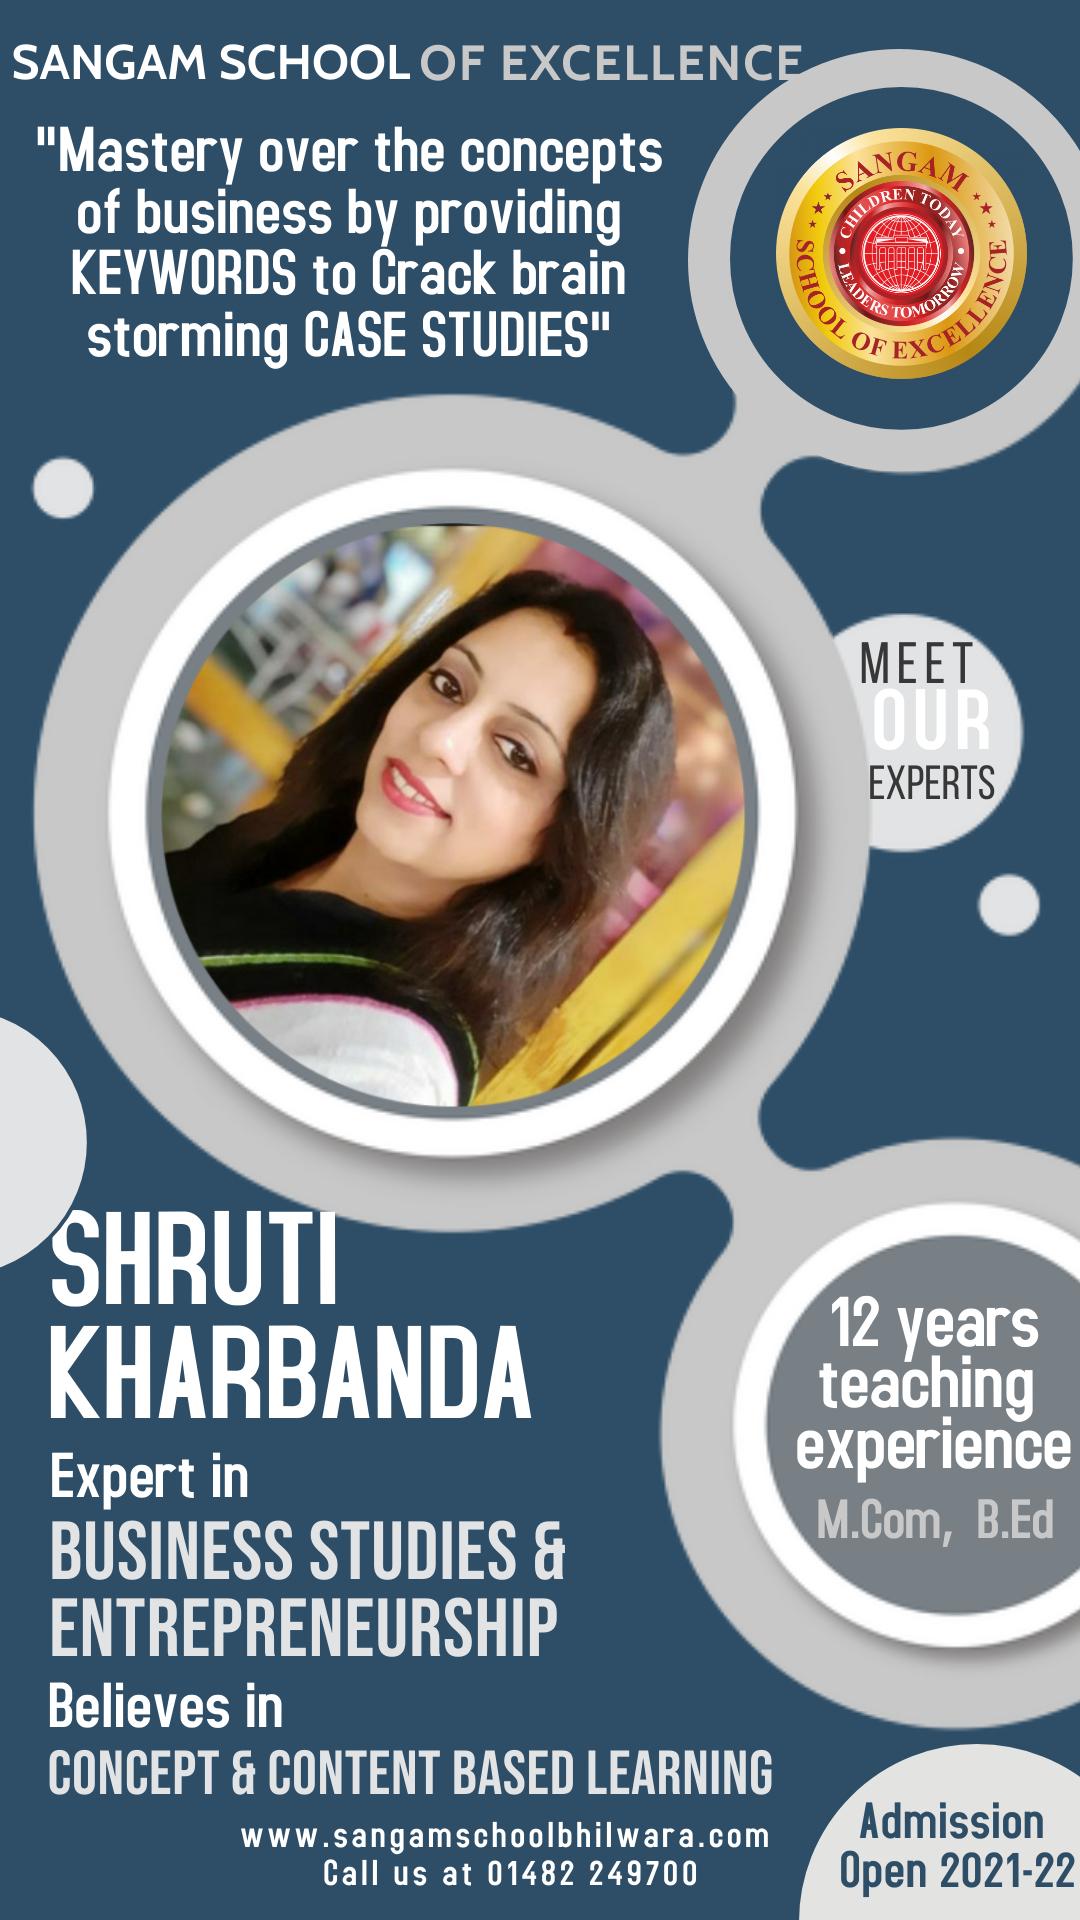 Ms Shruti Kharbanda